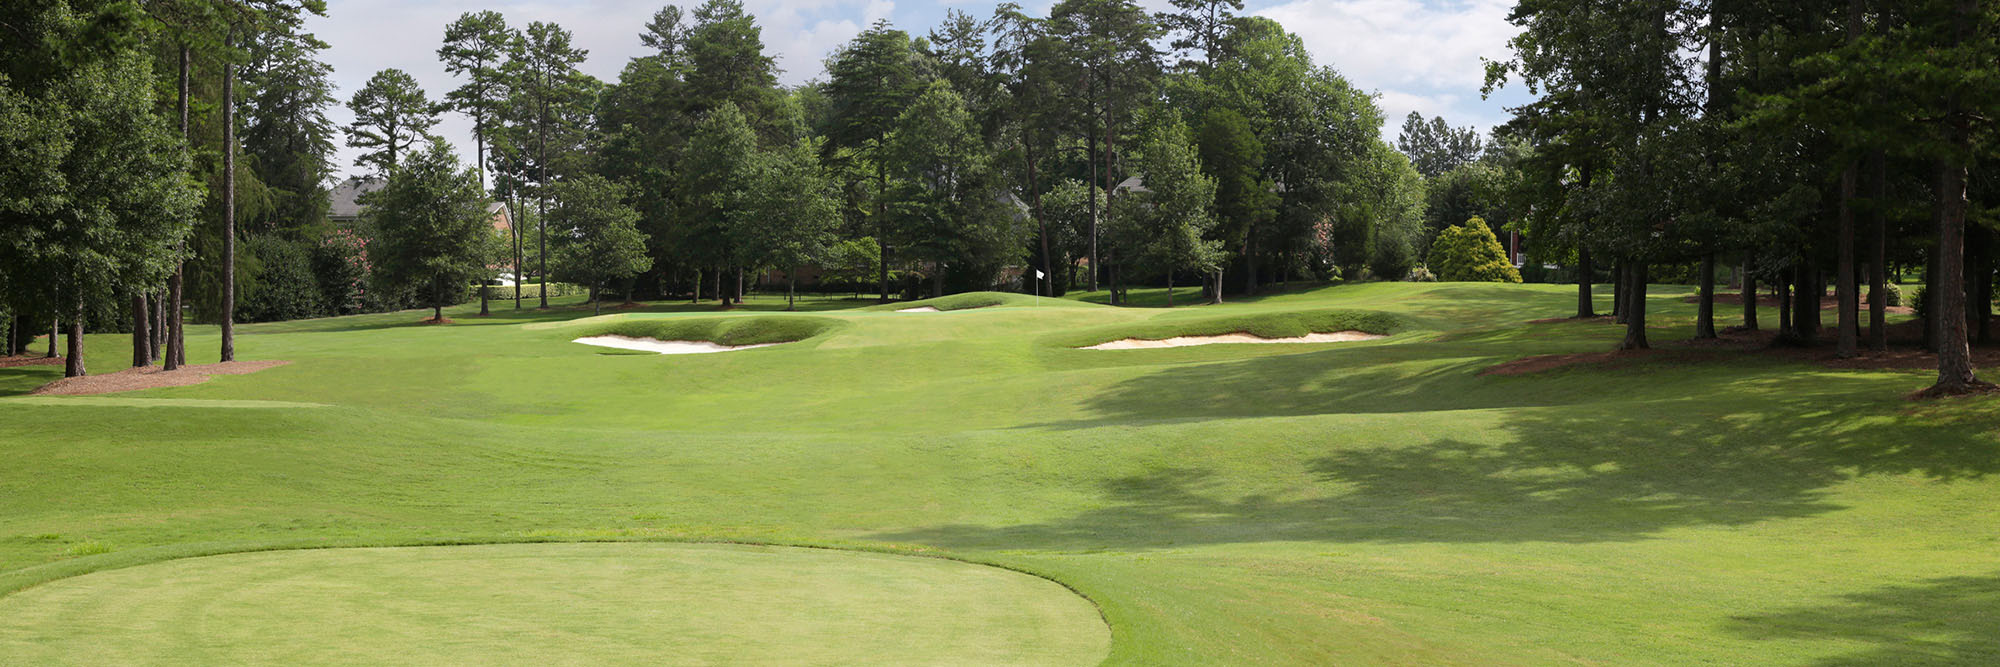 Golf Course Image - River Run Country Club No. 14